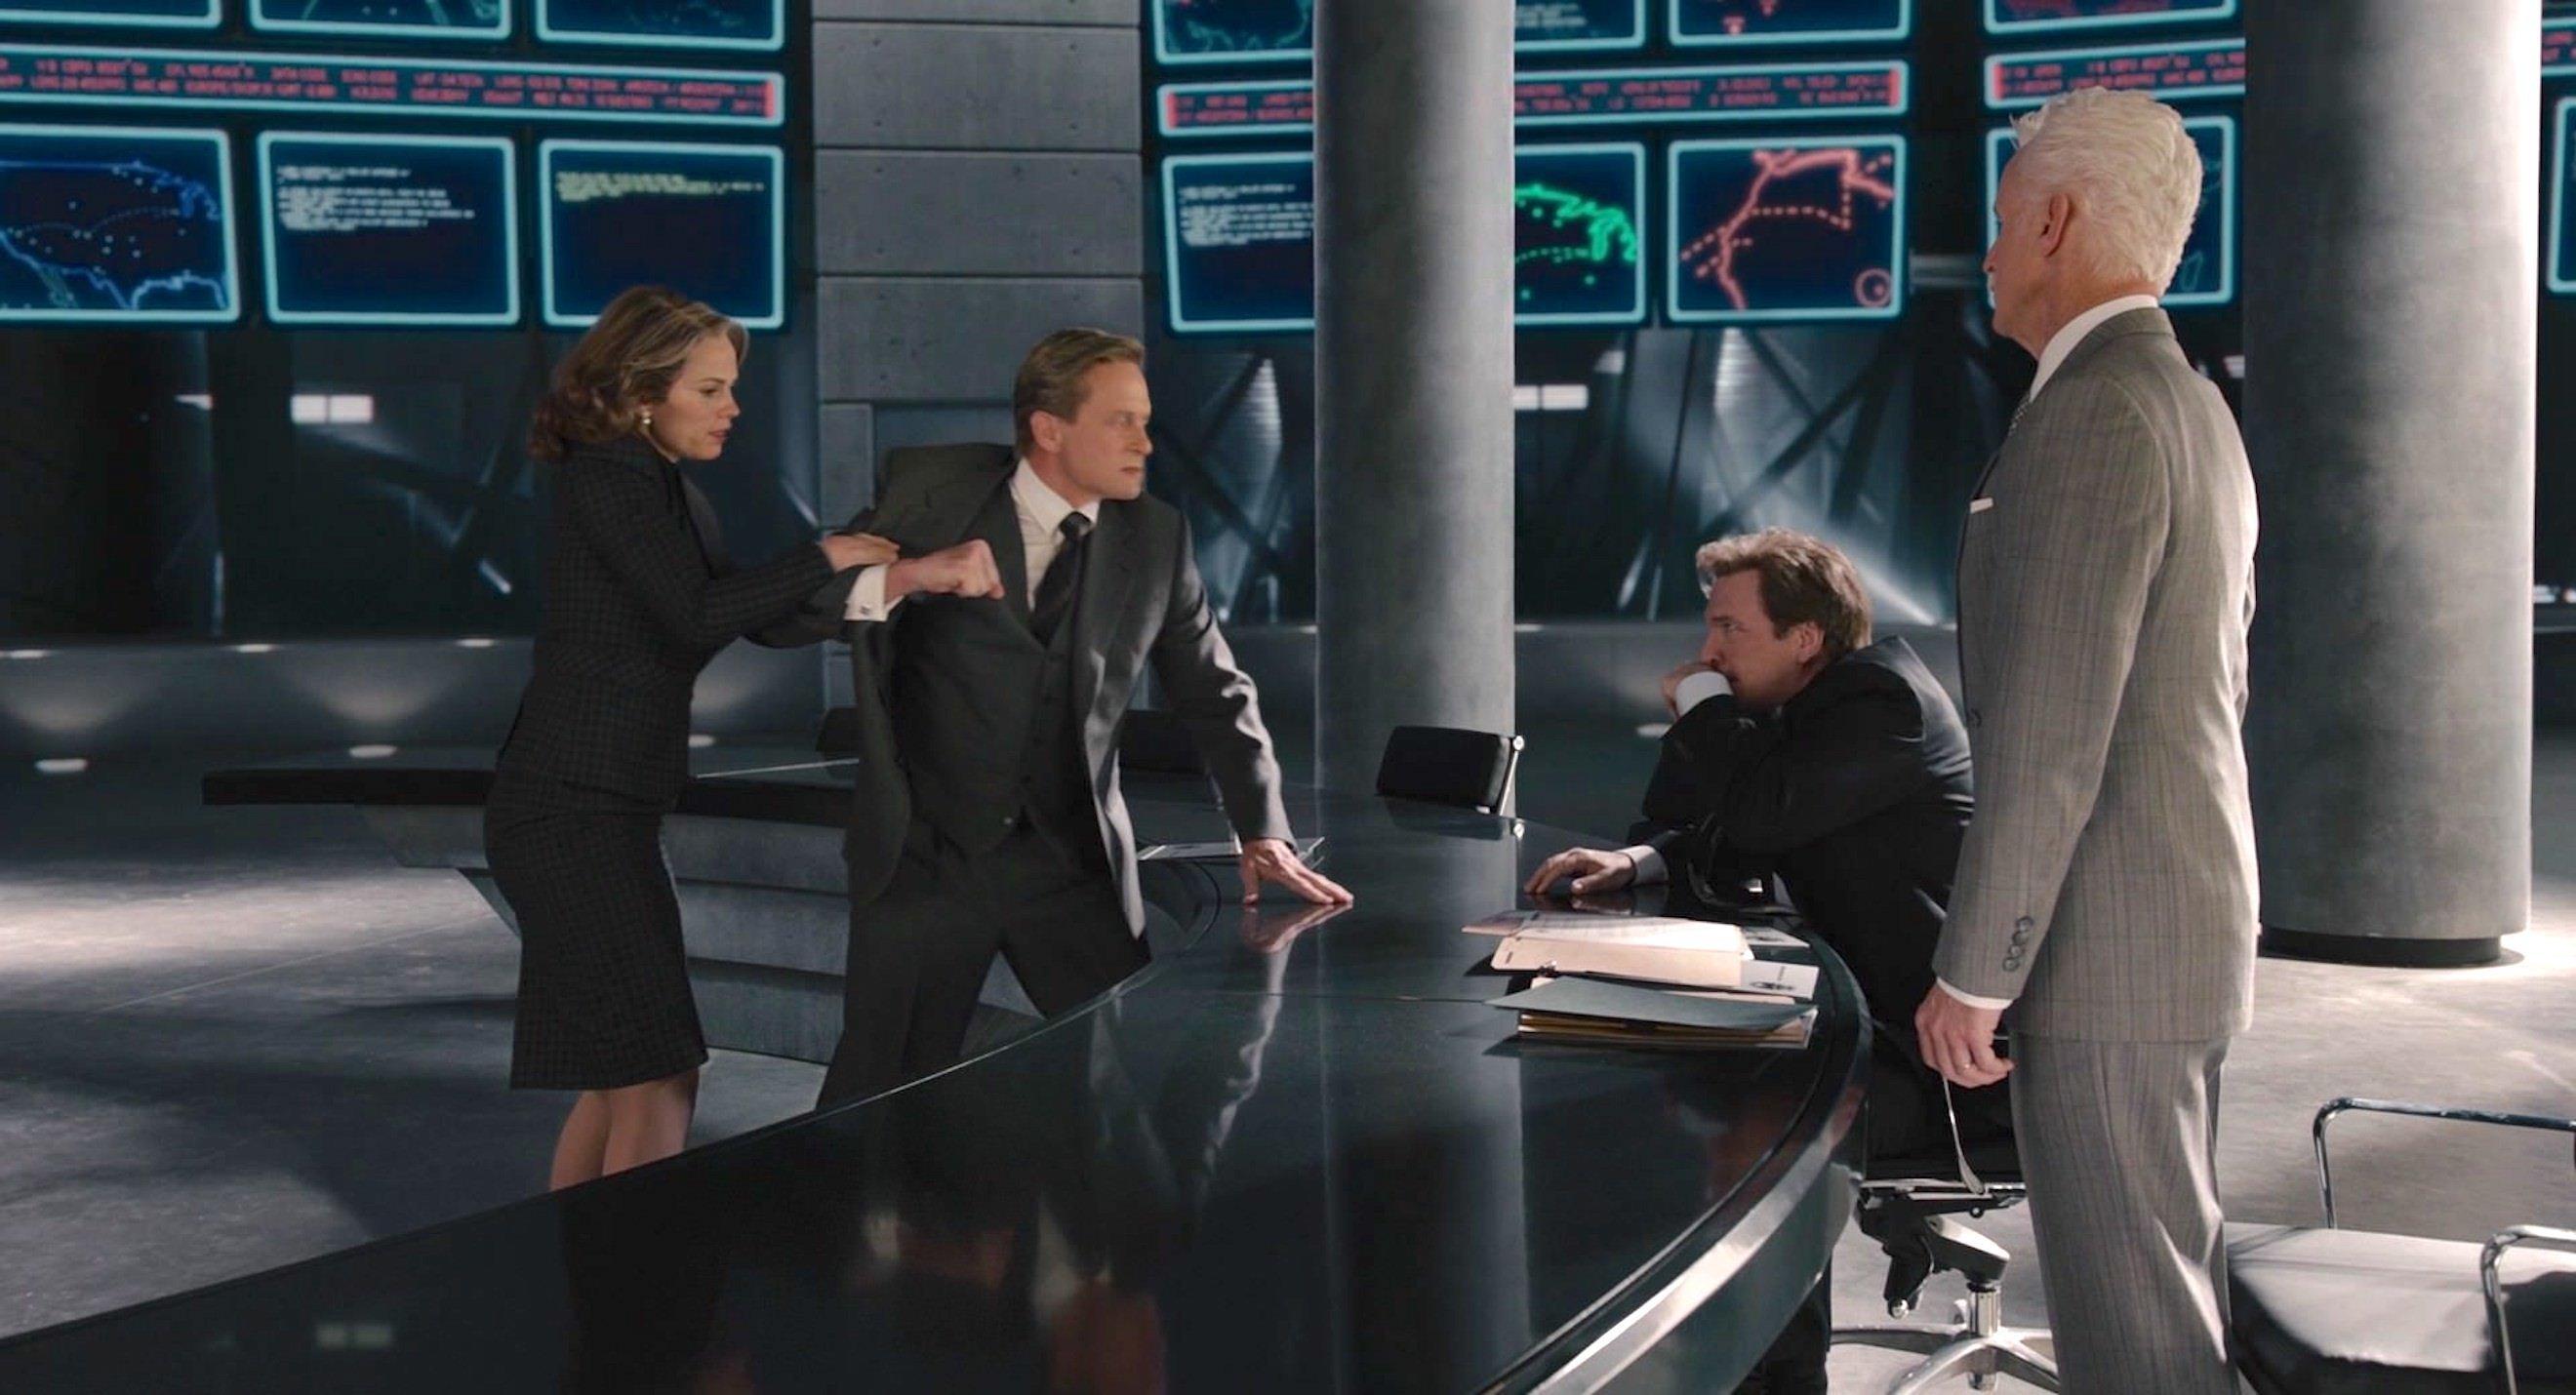 Michael Douglas, Martin Donovan, John Slattery, and Hayley Atwell in Ant-Man (2015)